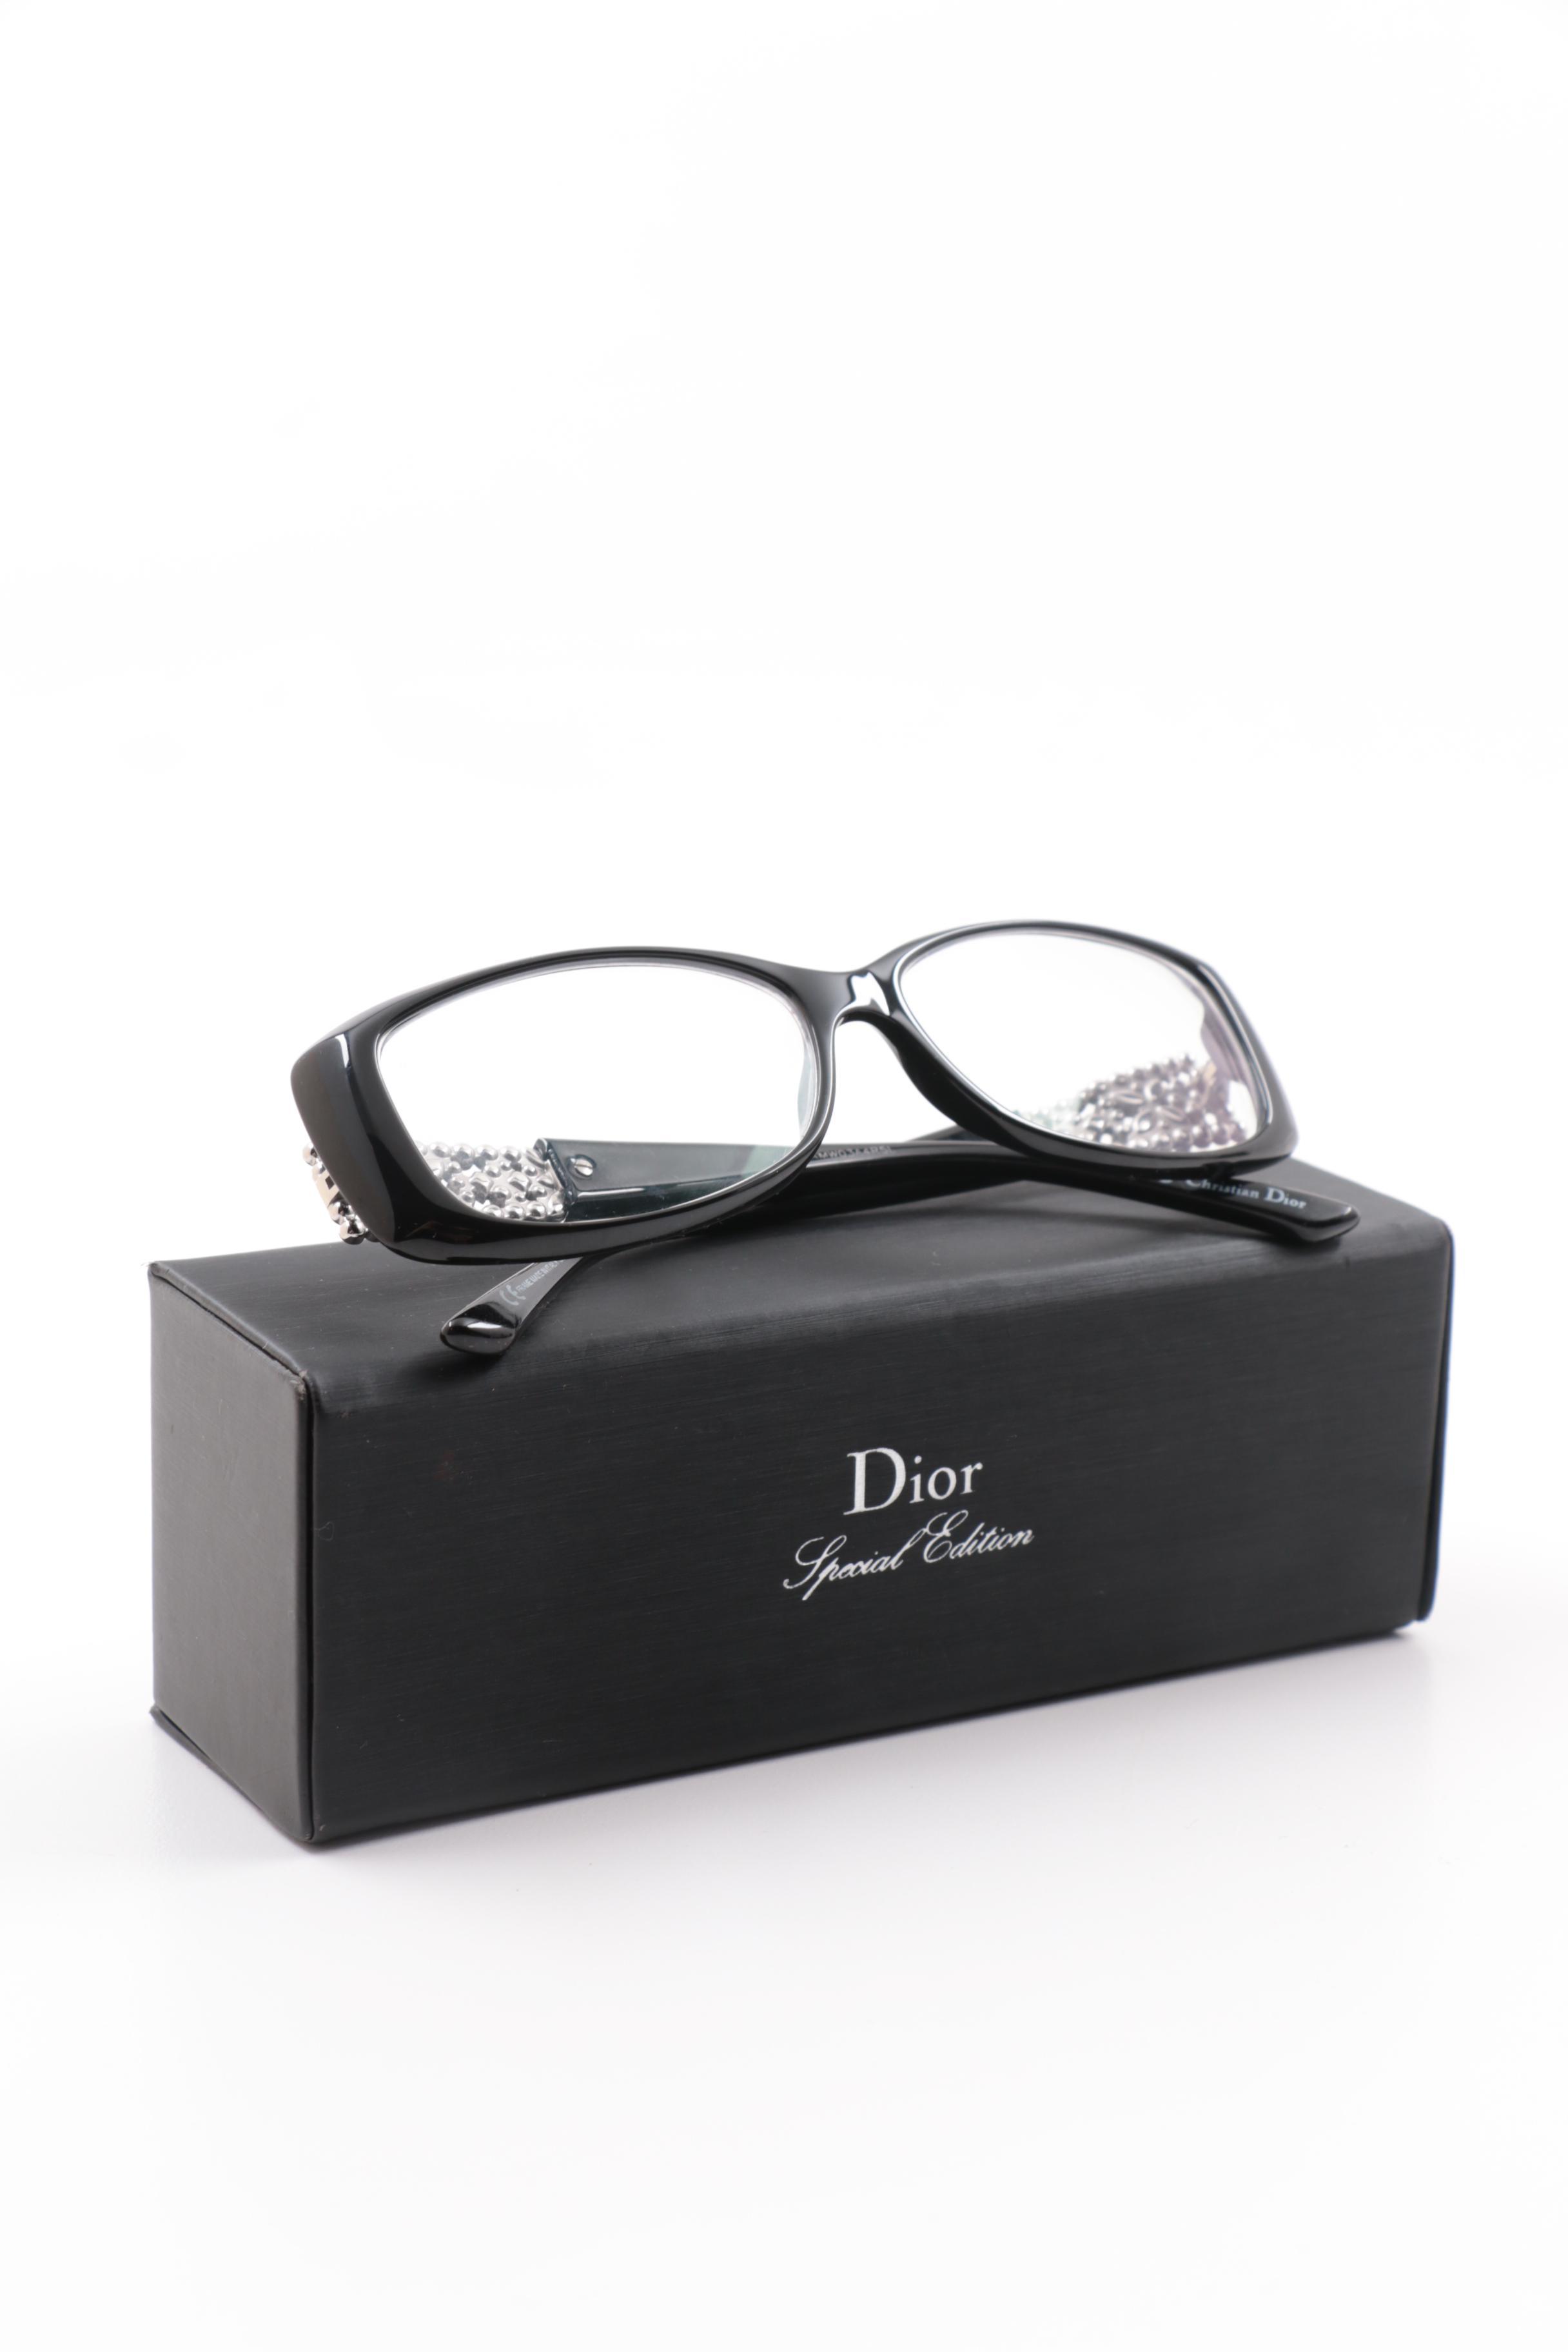 66bb6fae102b Christian dior special edition black frame and rhinestone reading glasses  JPG 880x880 Christian dior eyeglasses with